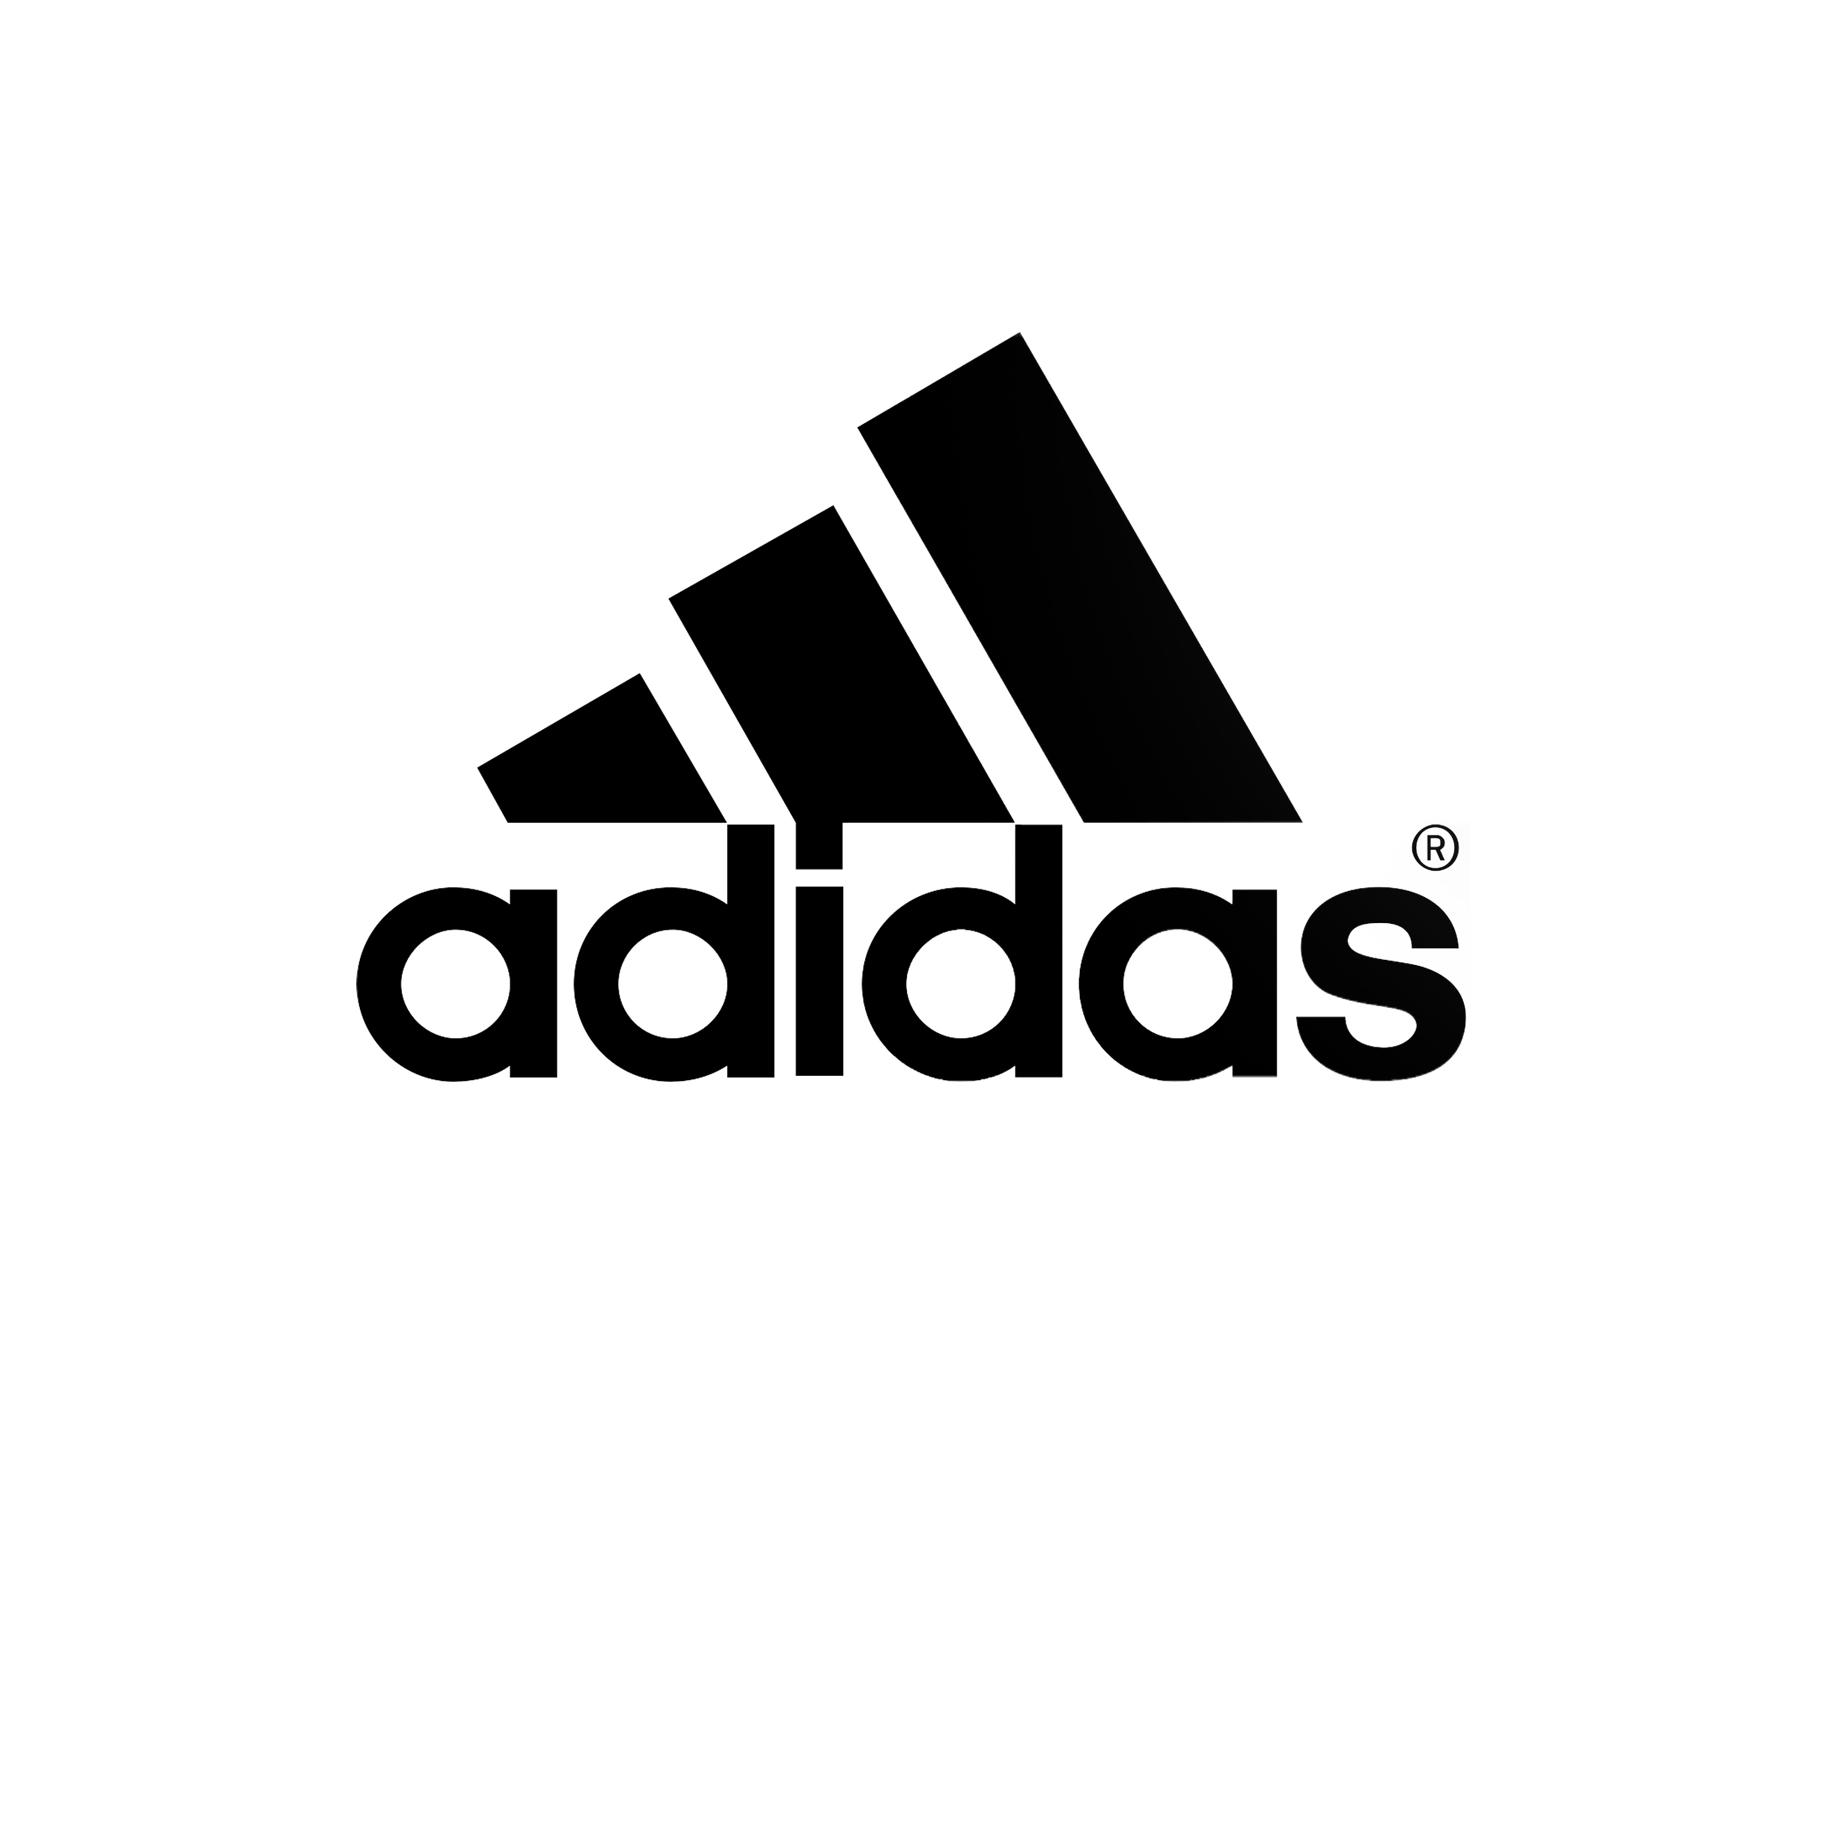 Adidas-Verano-Studios.jpg